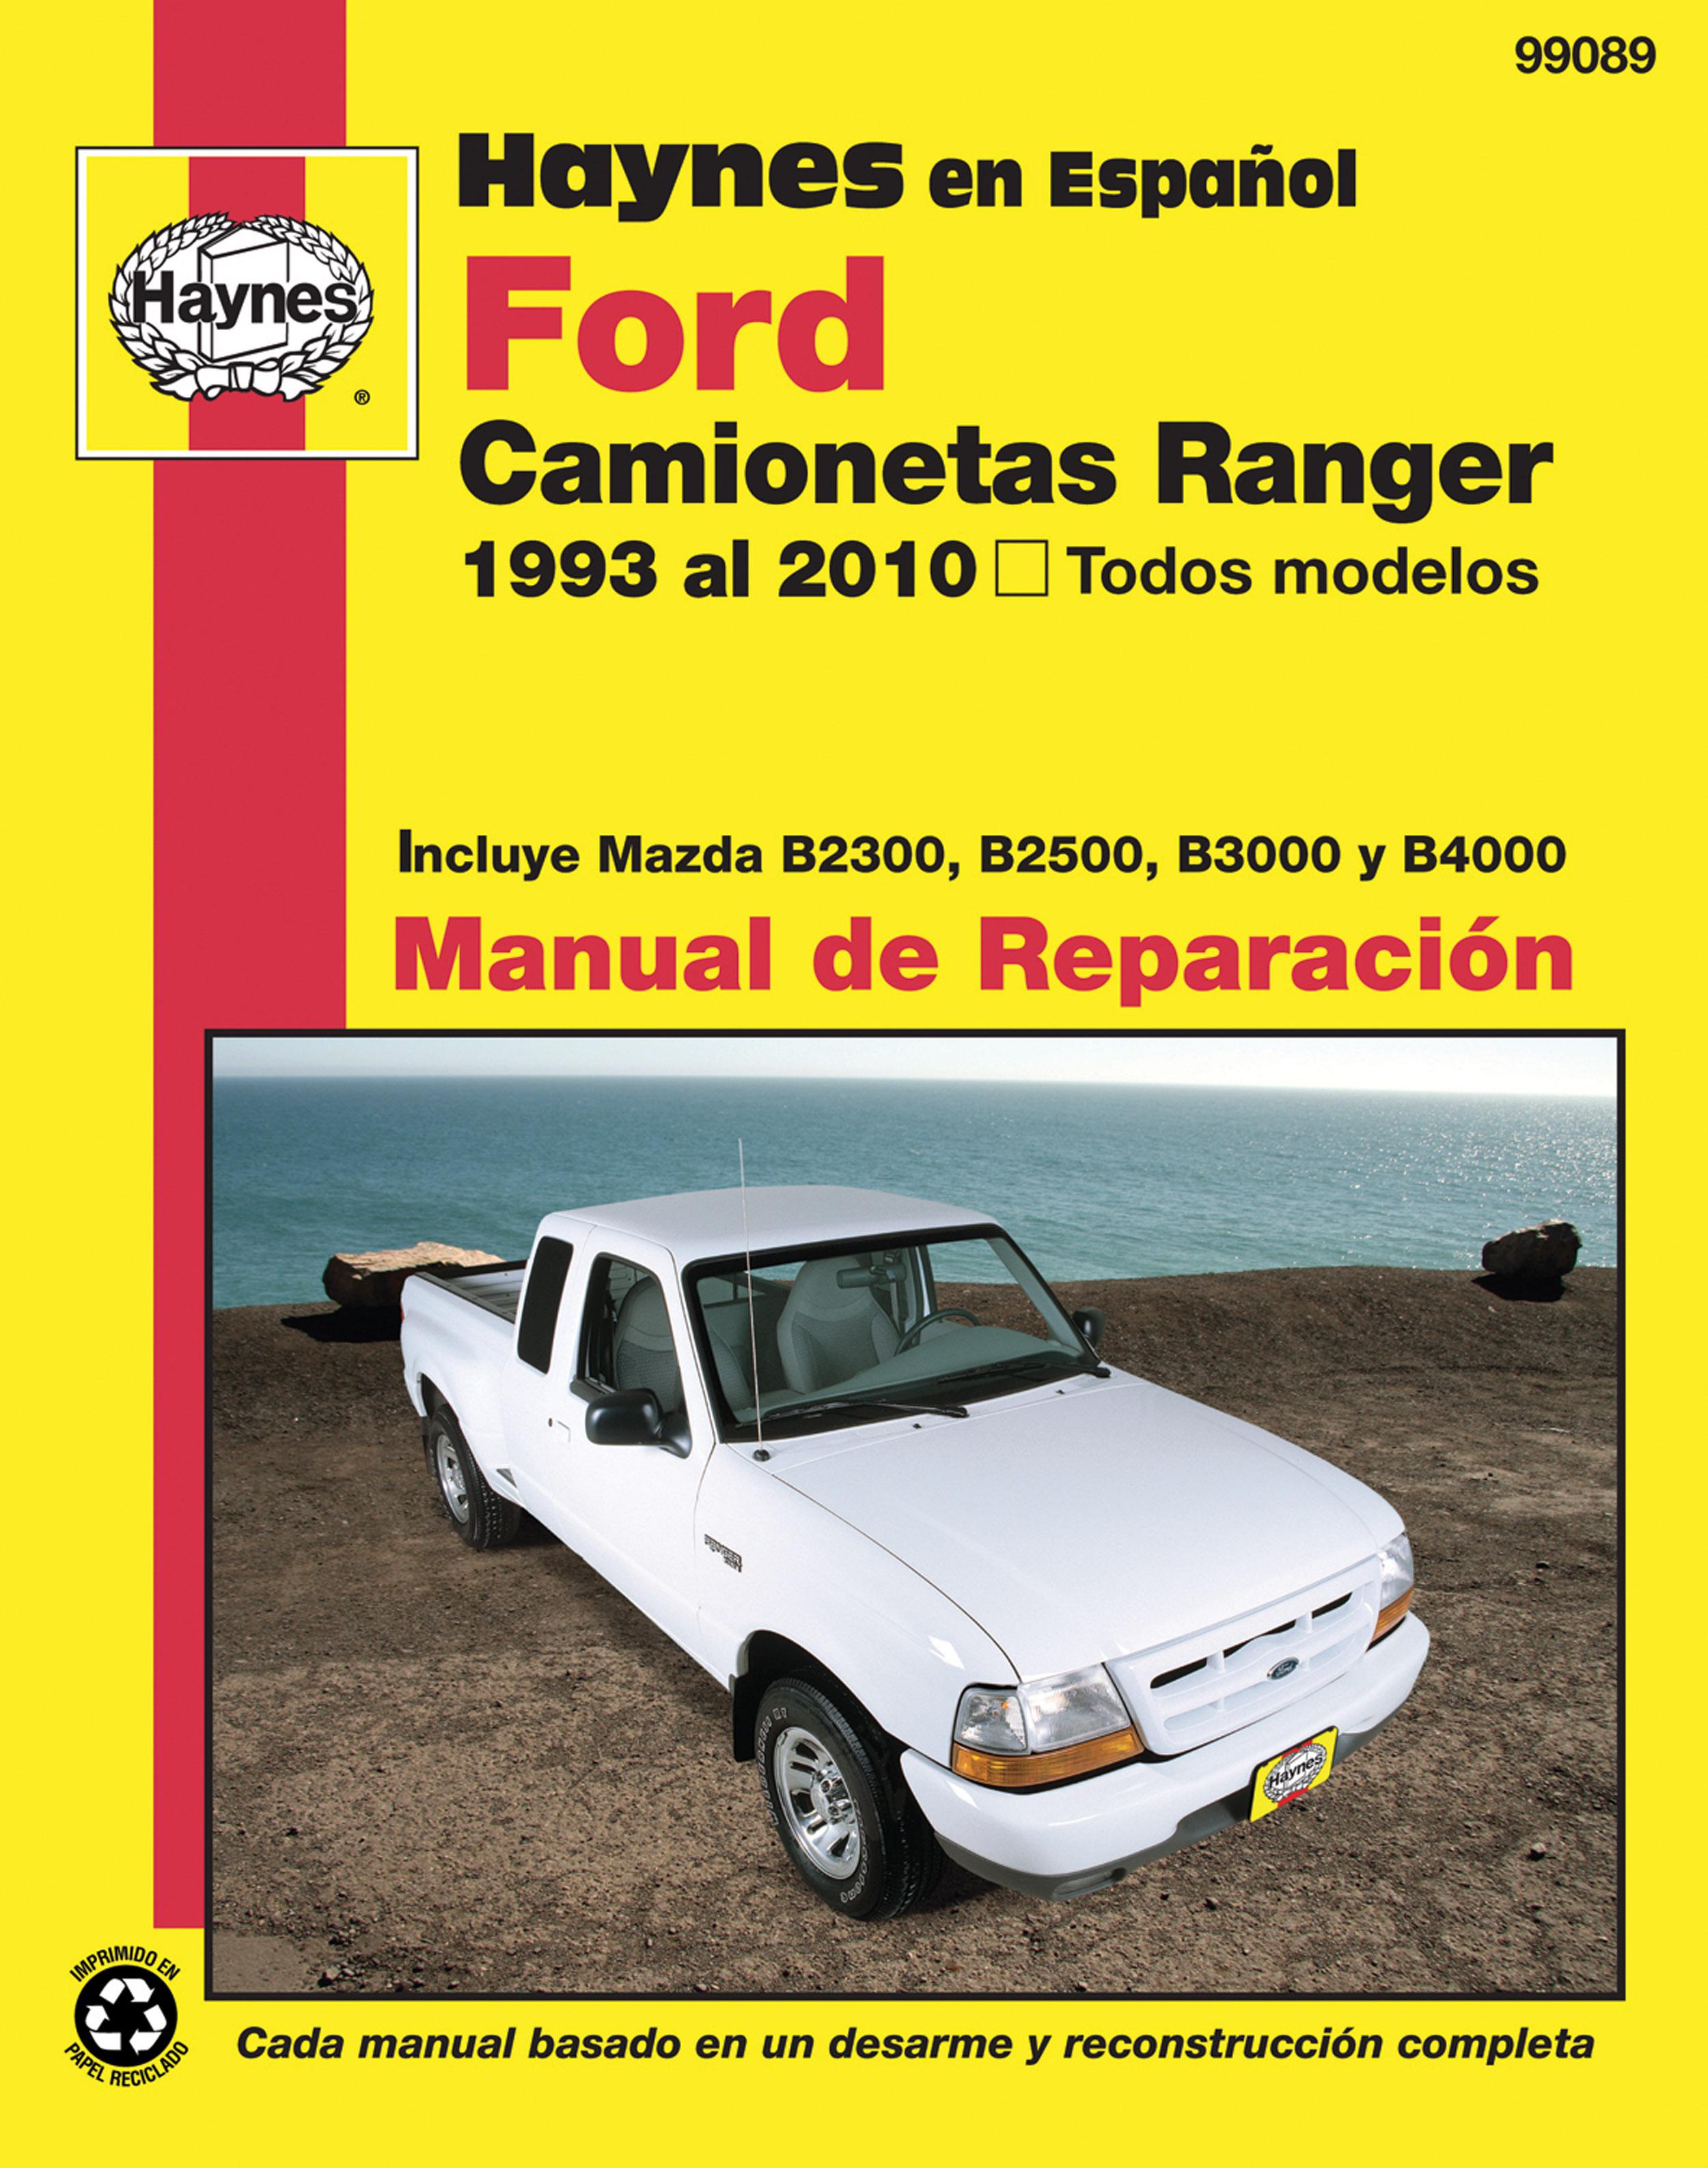 Manual de-mazda-b2500.